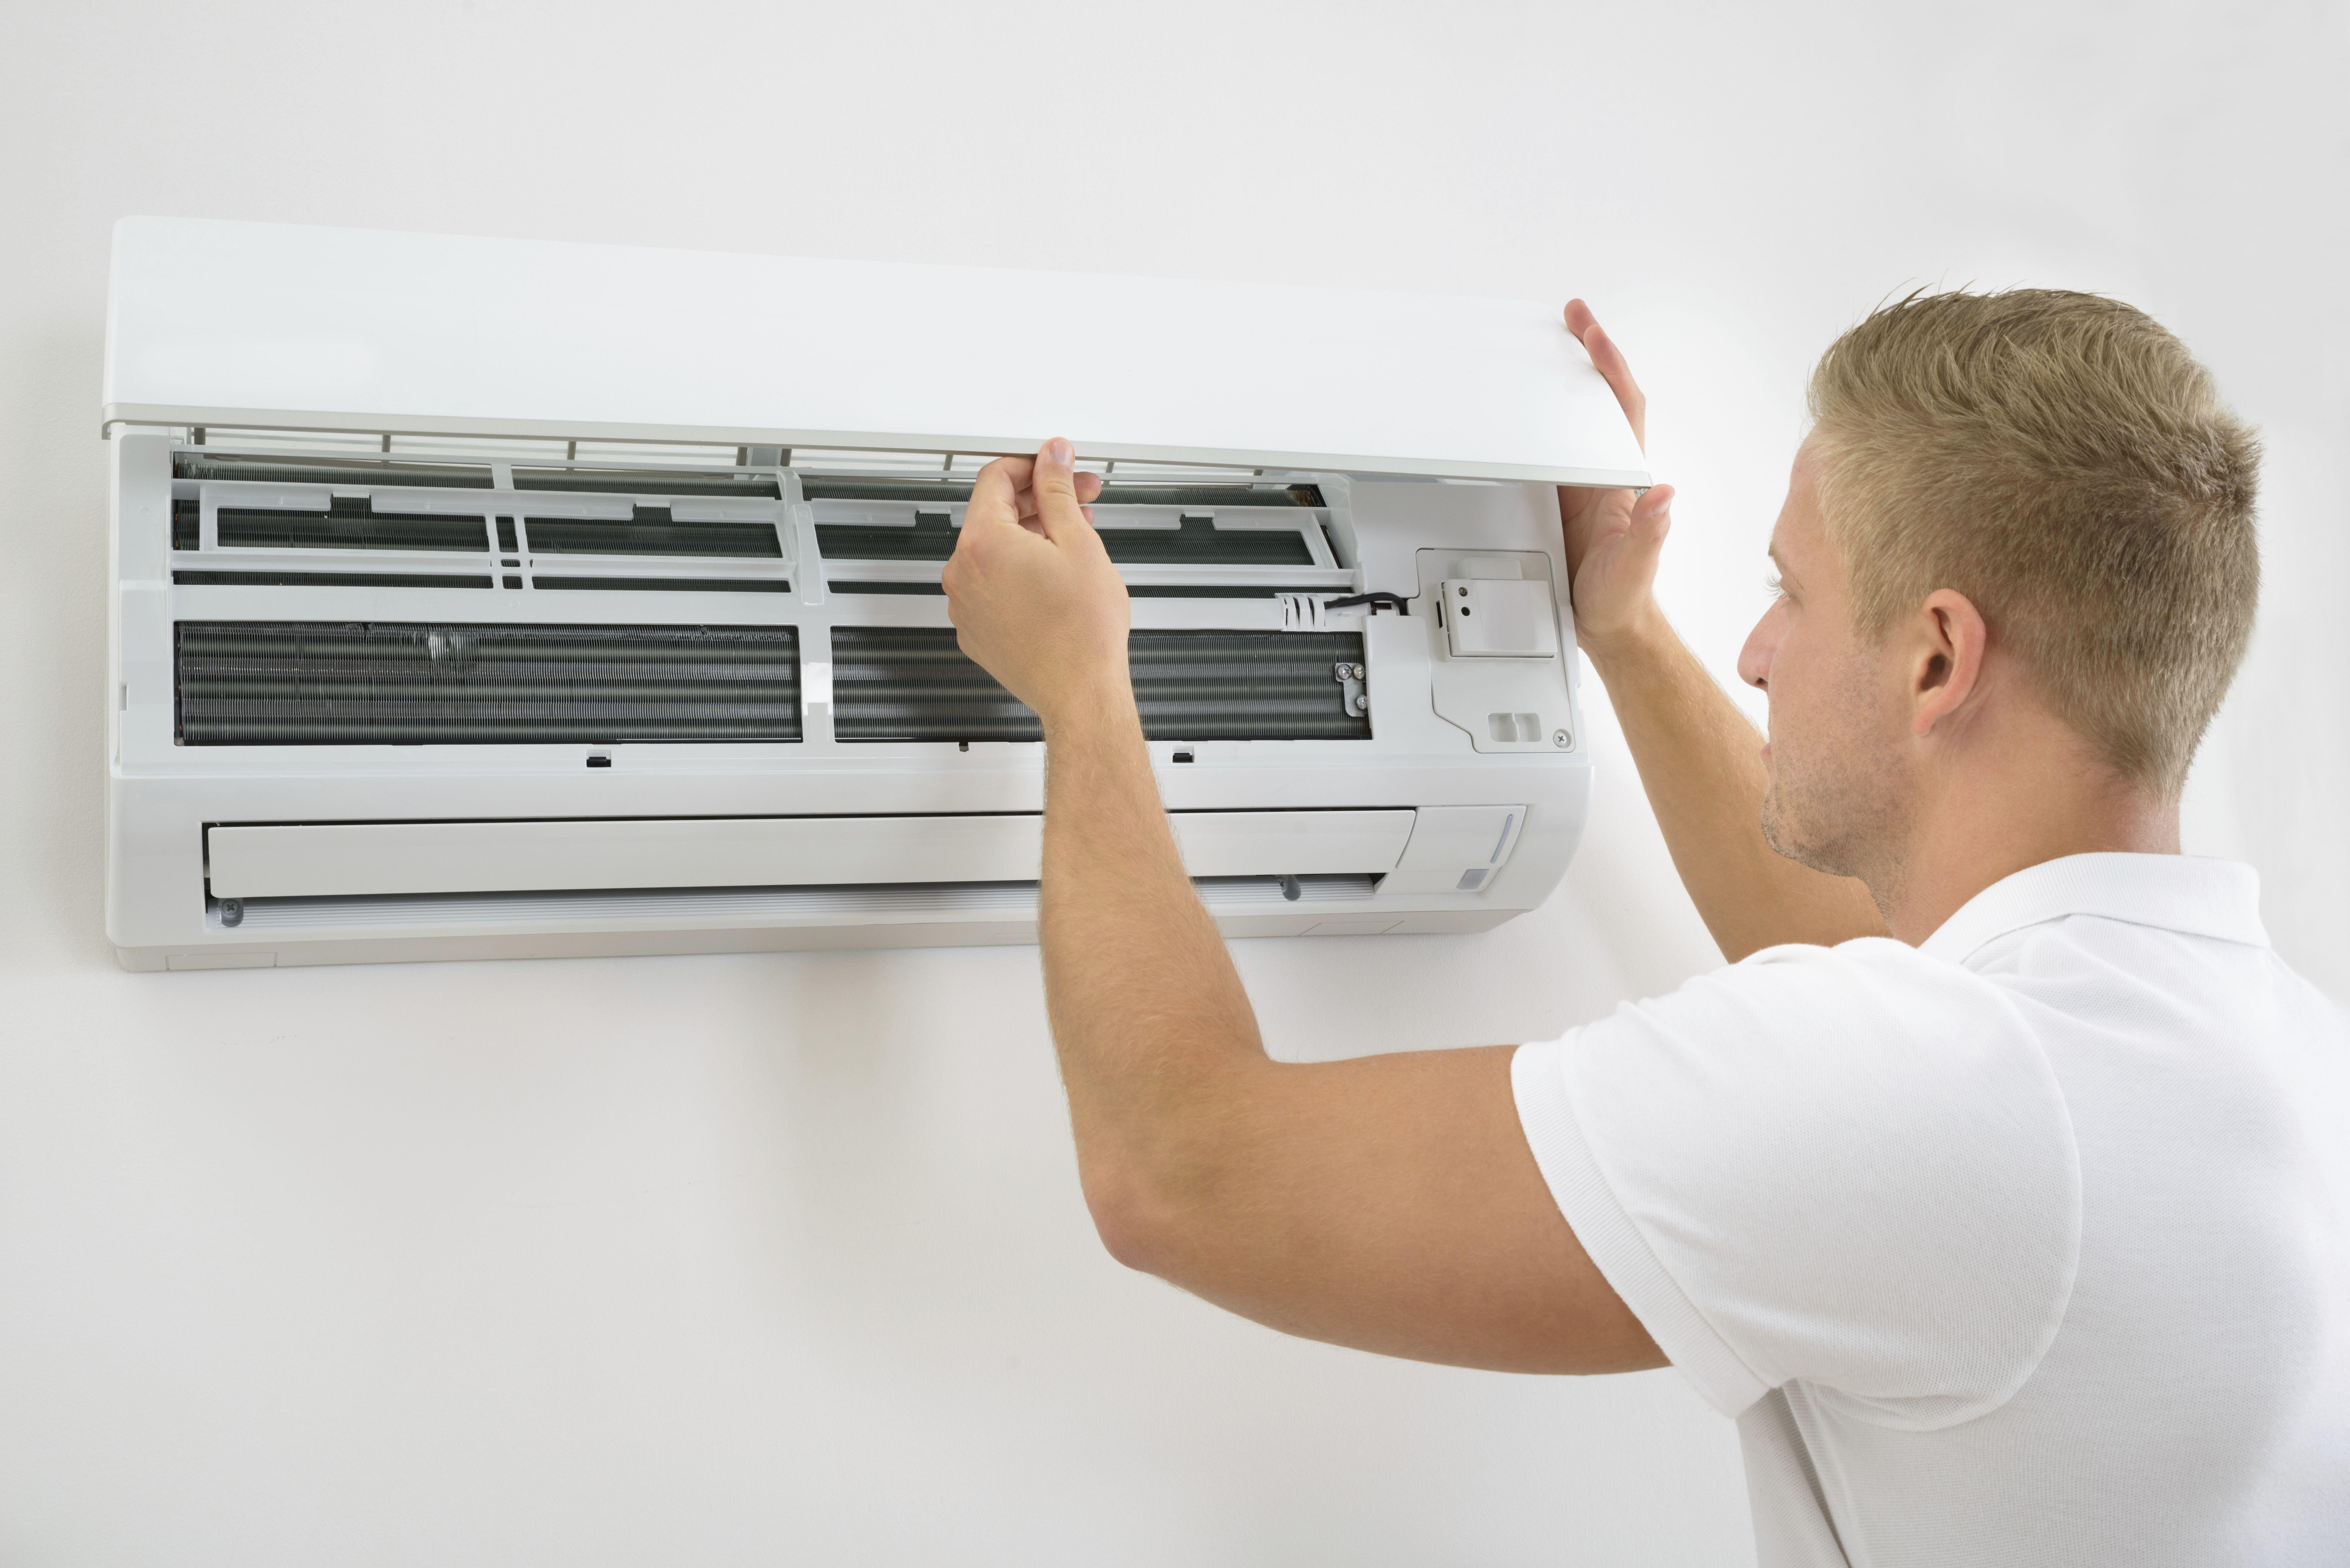 Aire acondicionado: Servicios de Refrigeración Climatización López Casas S.L.